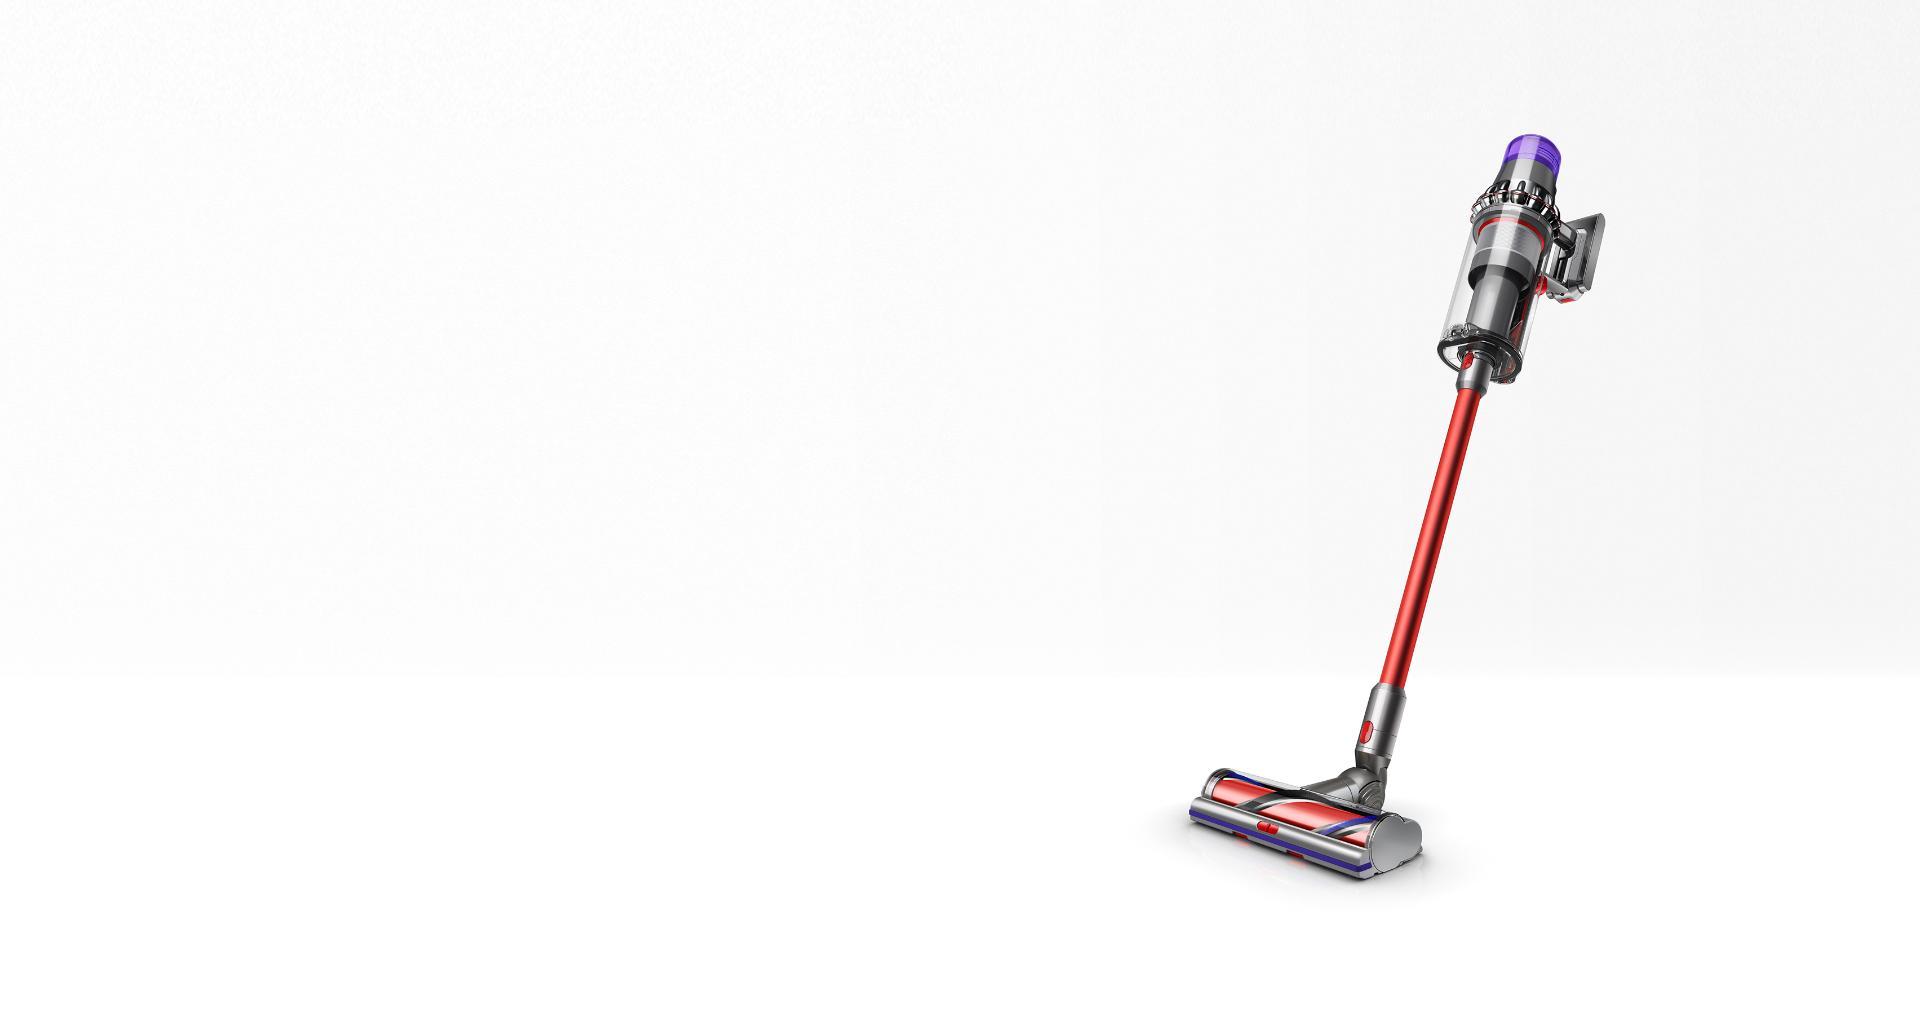 Dyson V11™ Outsize cordless vacuum cleaner